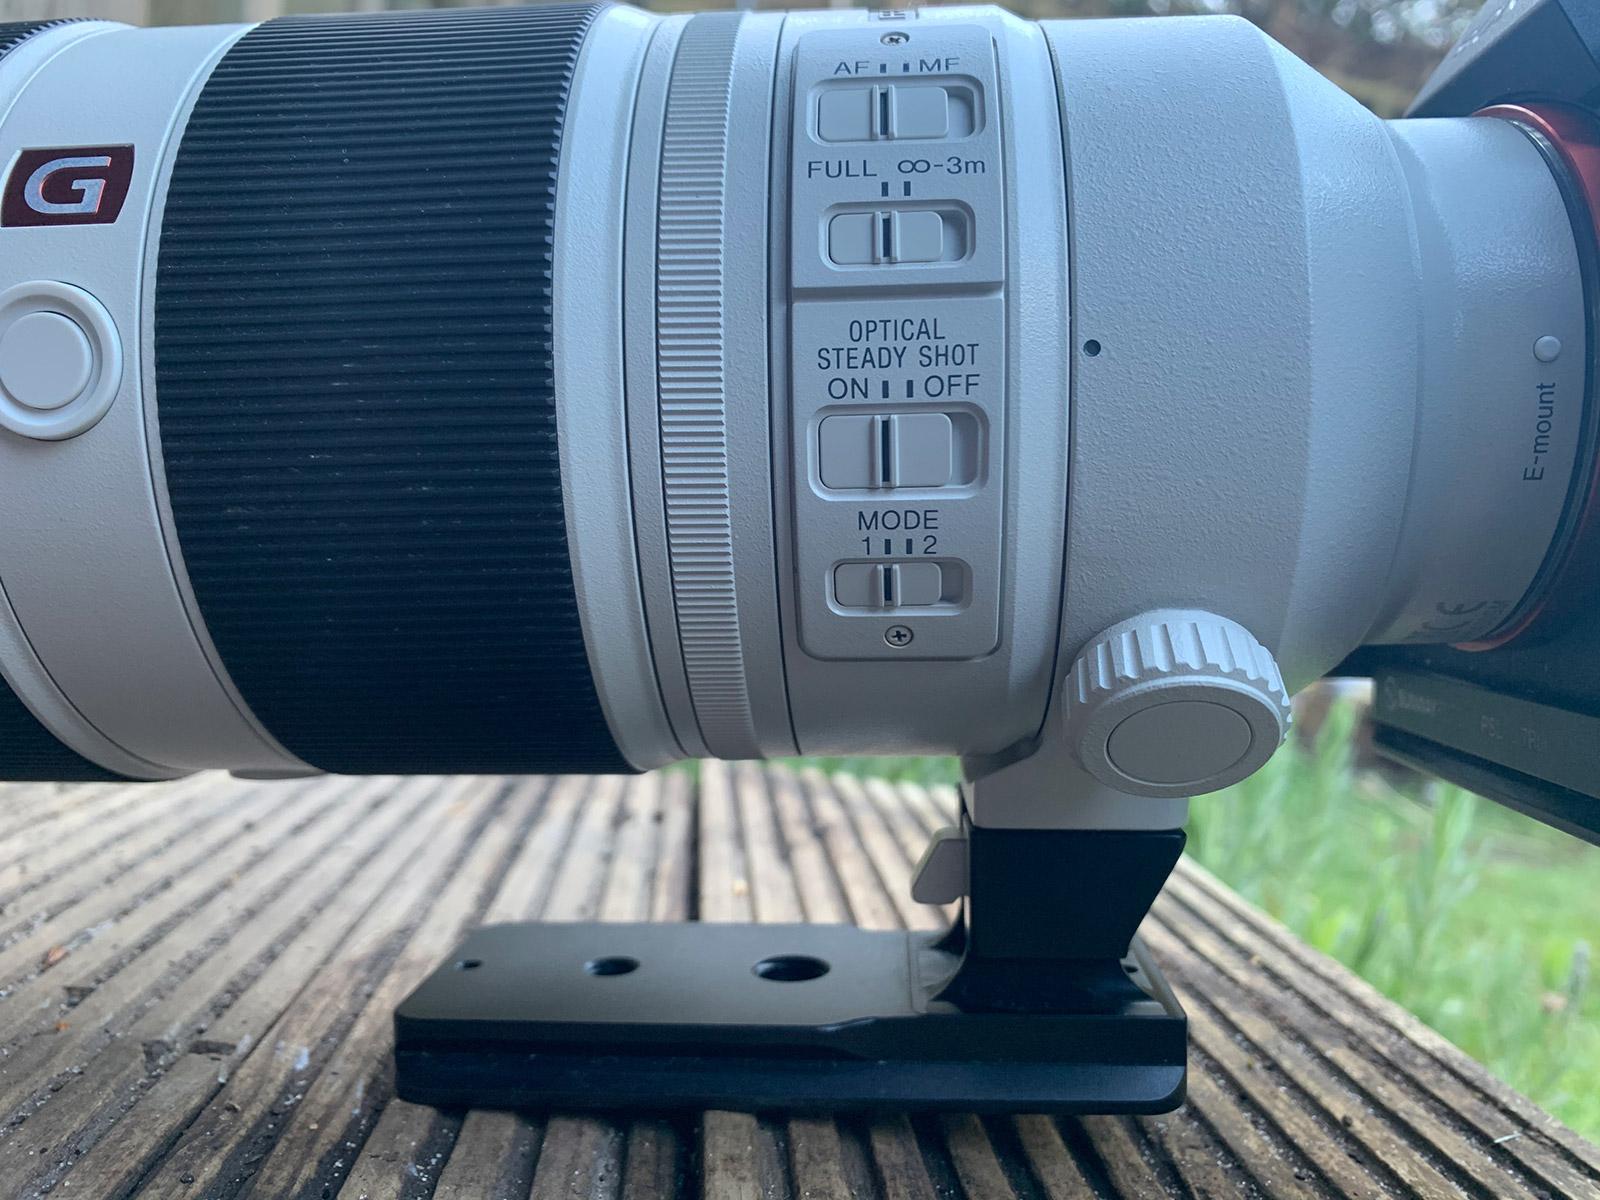 Controls on lens barrel Sony 100-400mm lens